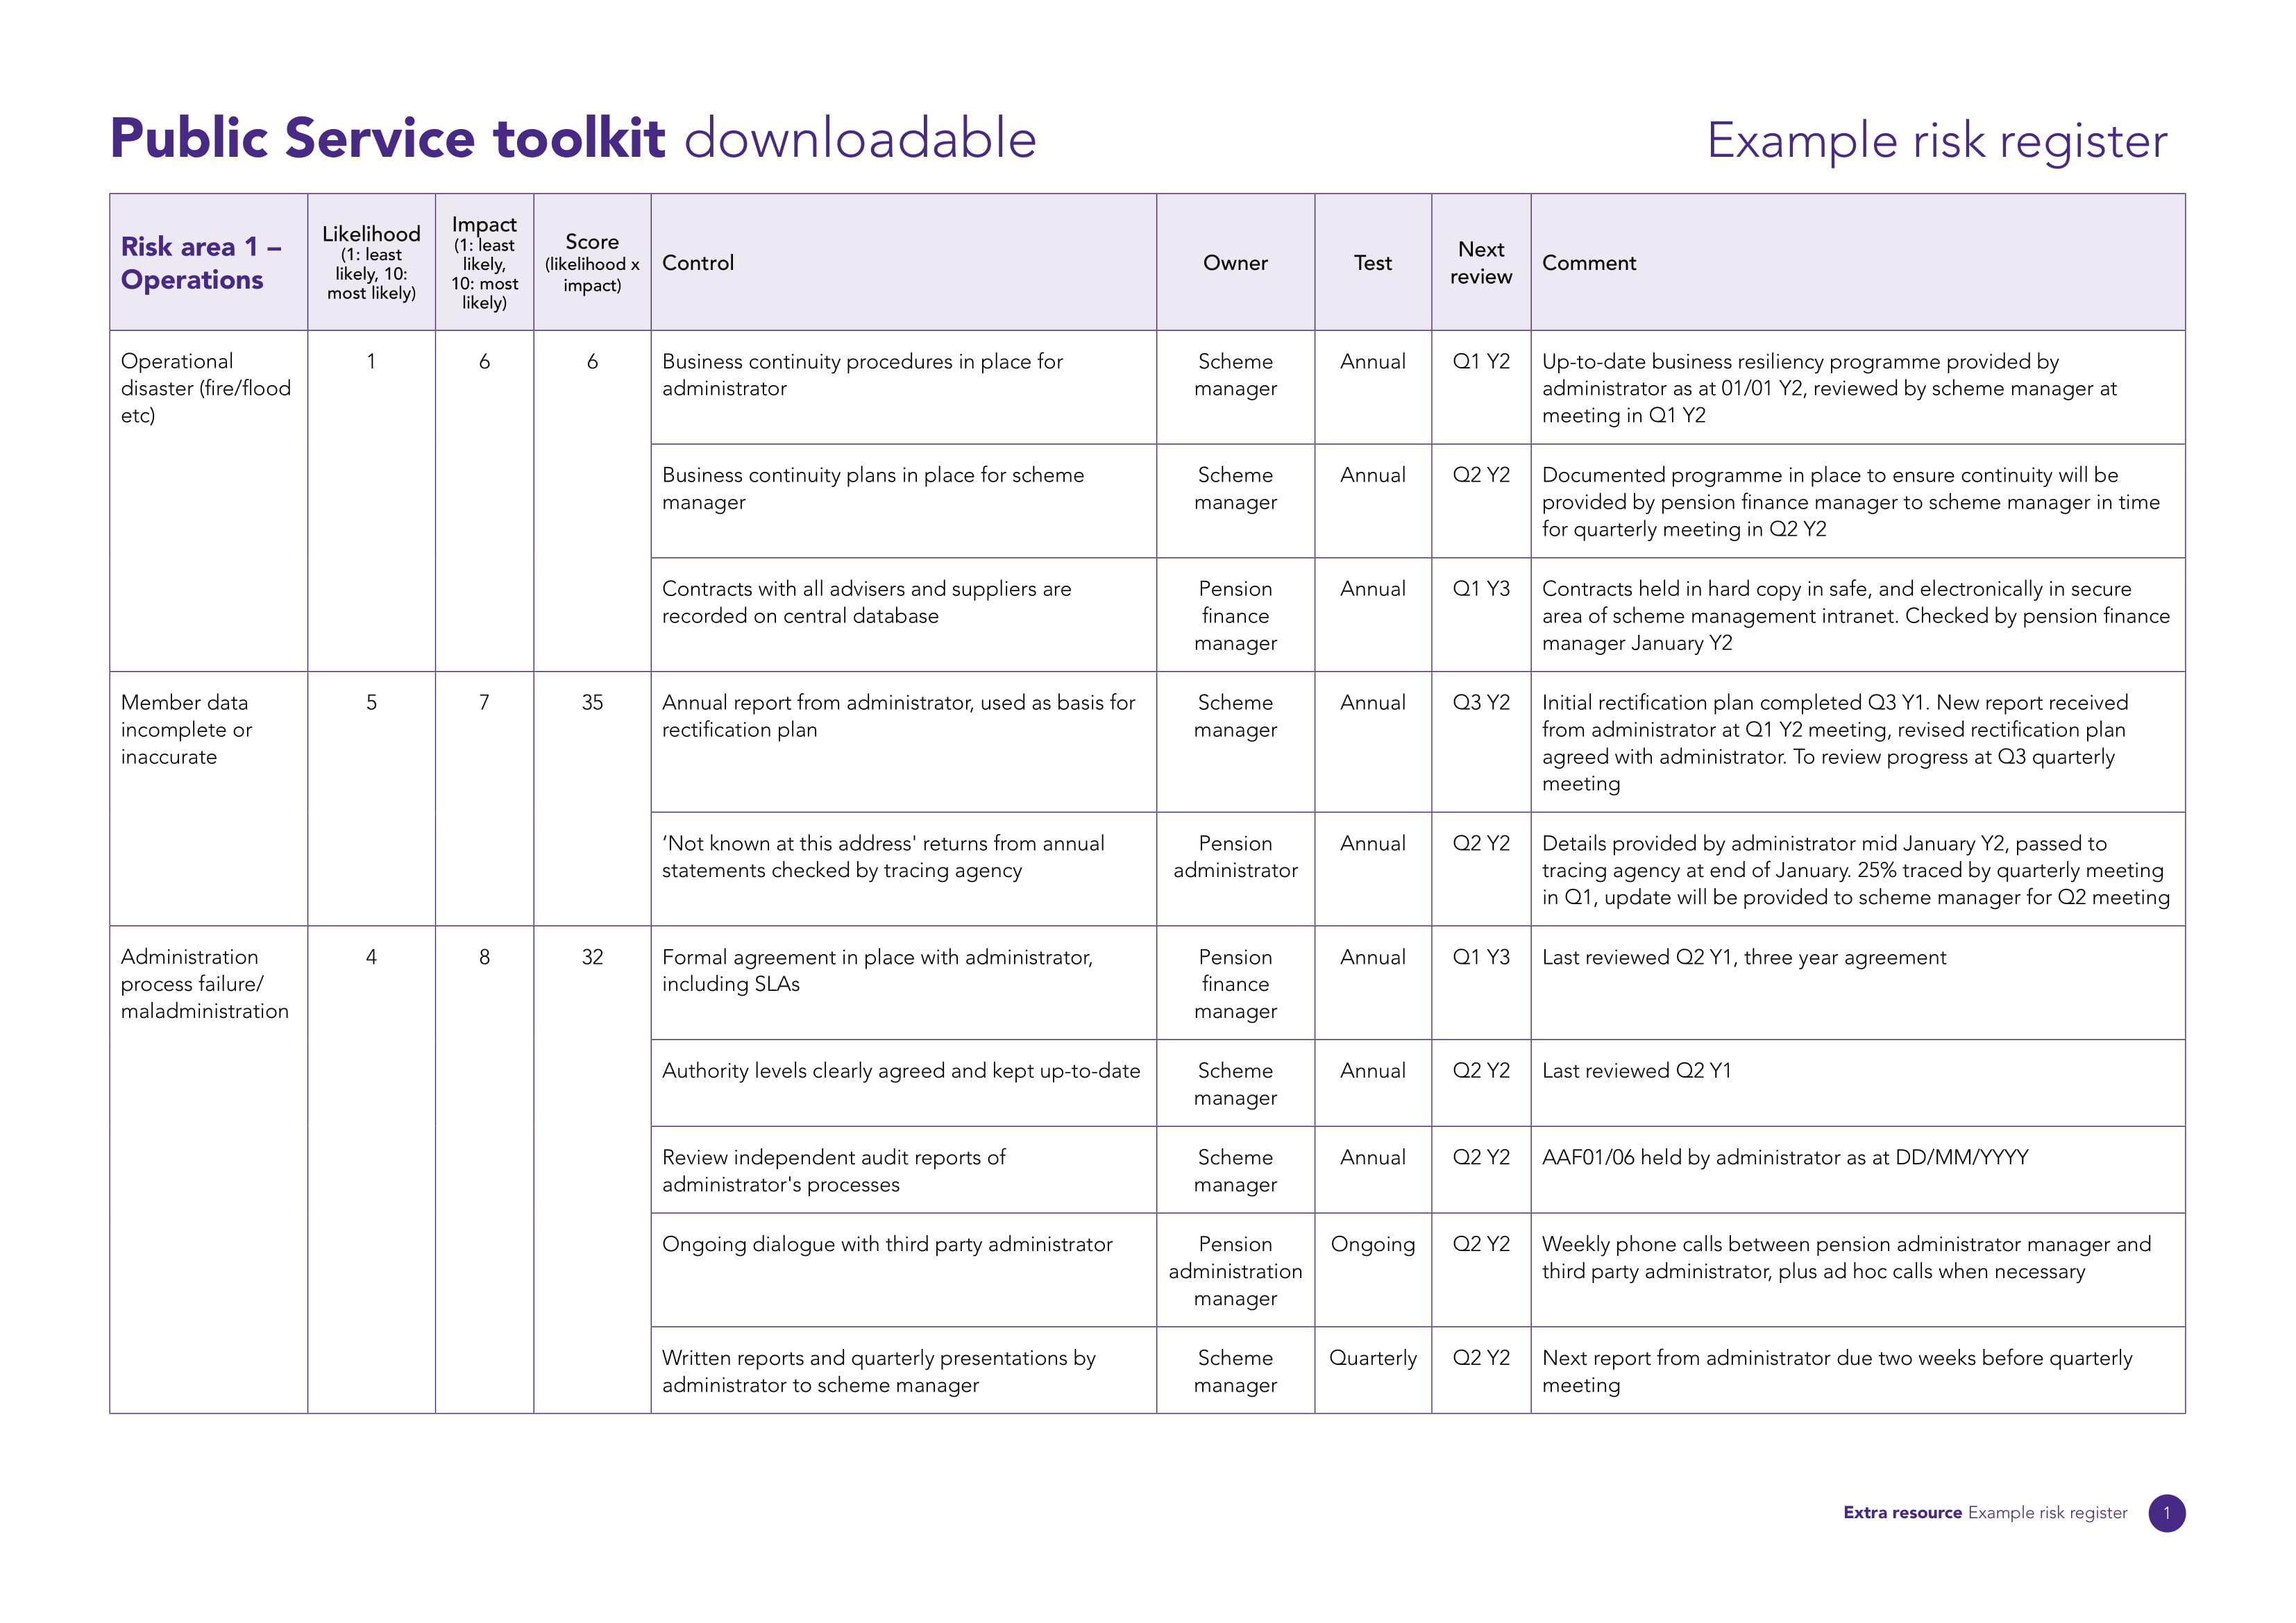 public service risk register example